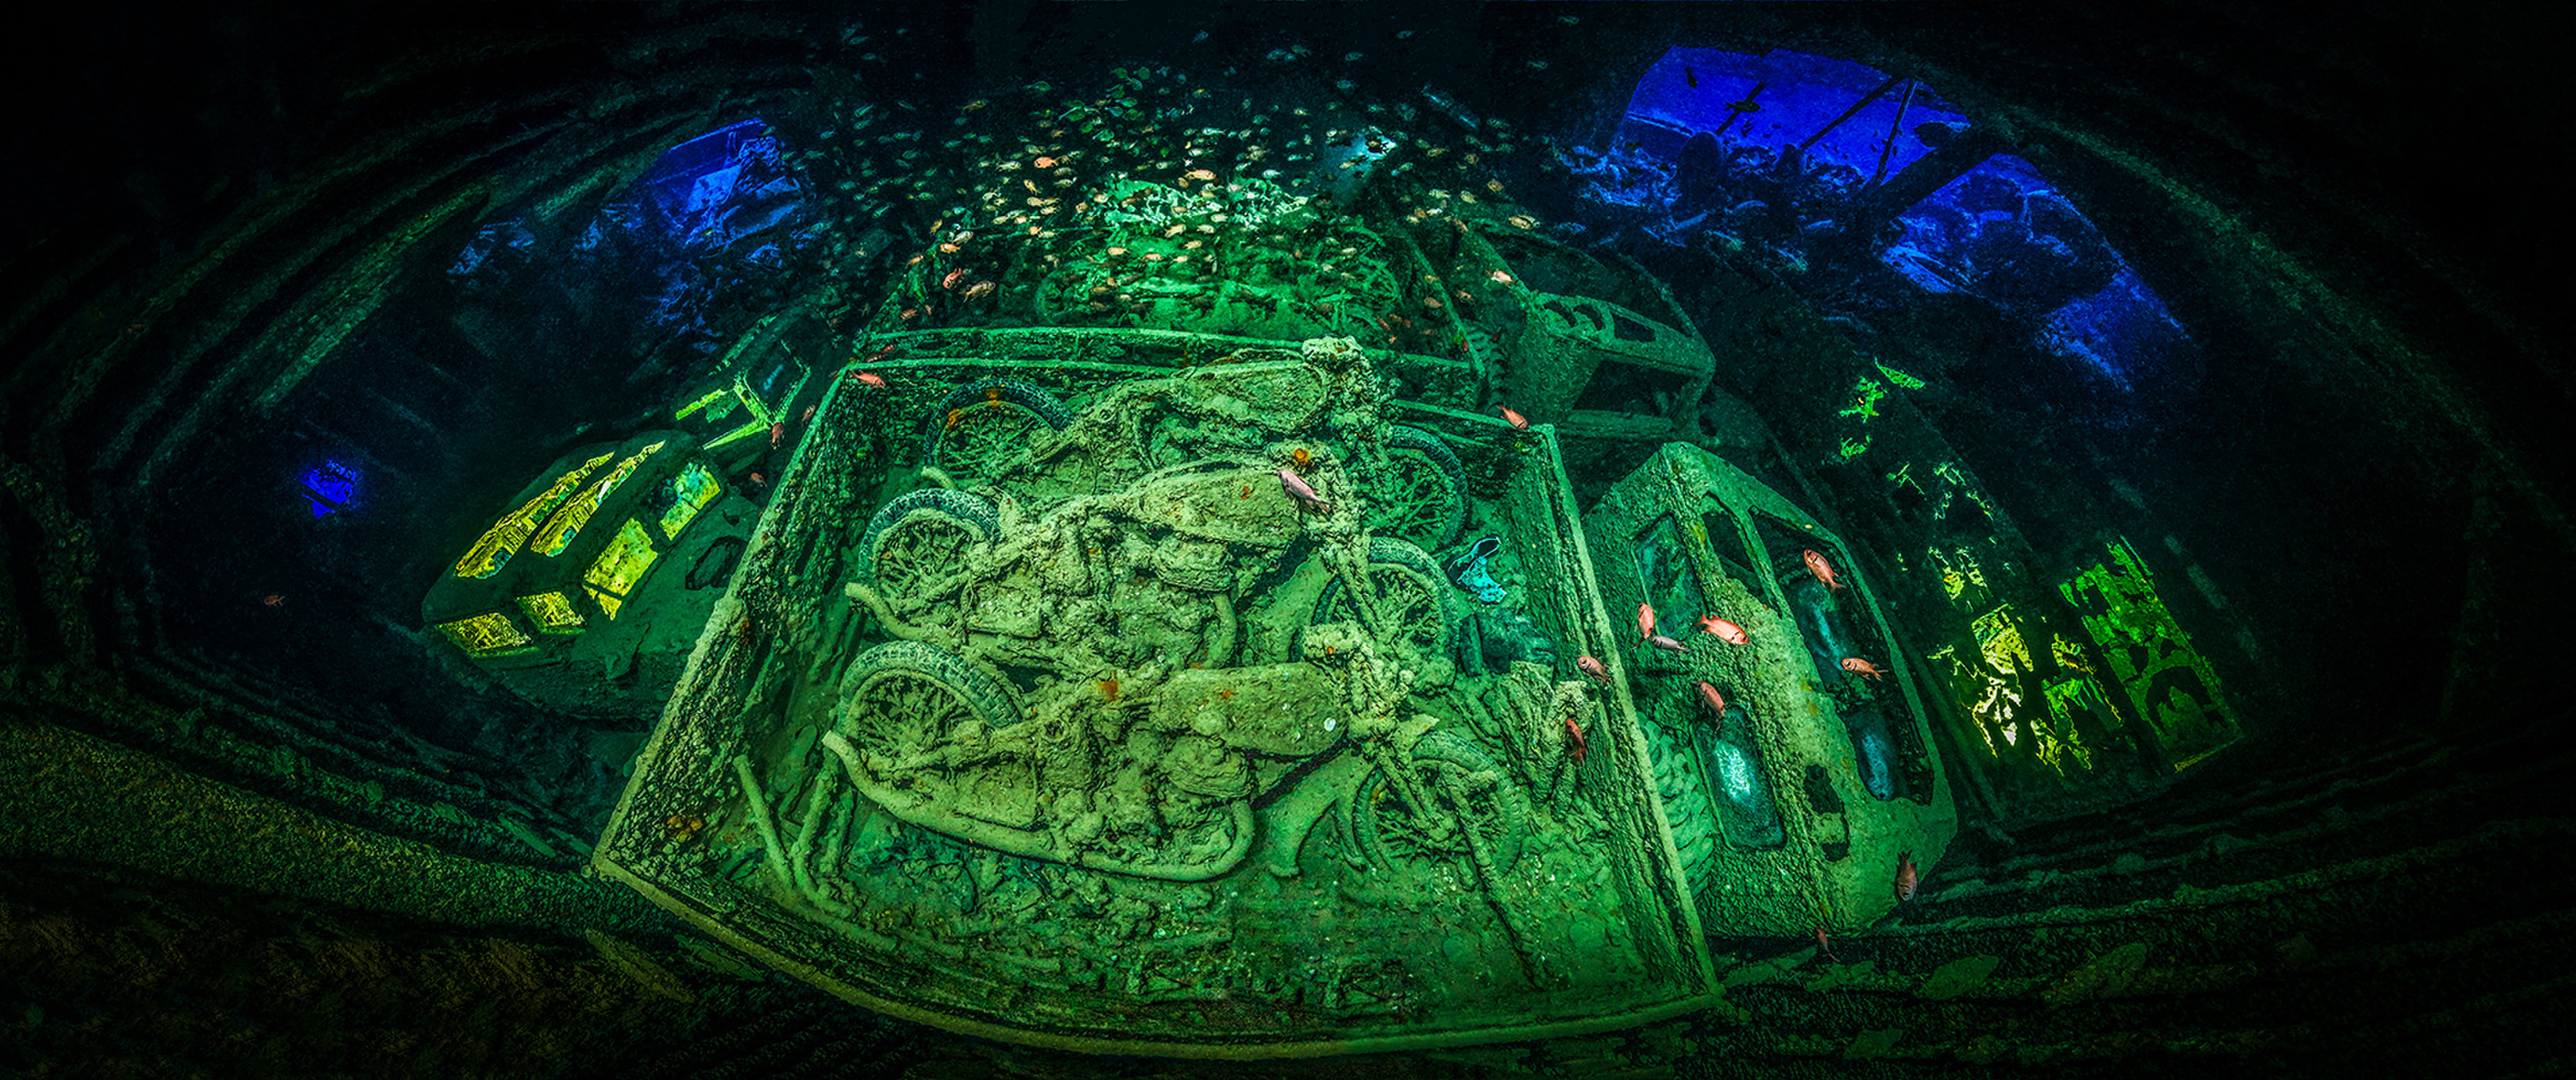 Фотография военных мотоциклов Norton 16H выиграла конкурс  «Underwater Photograph Of The Year»